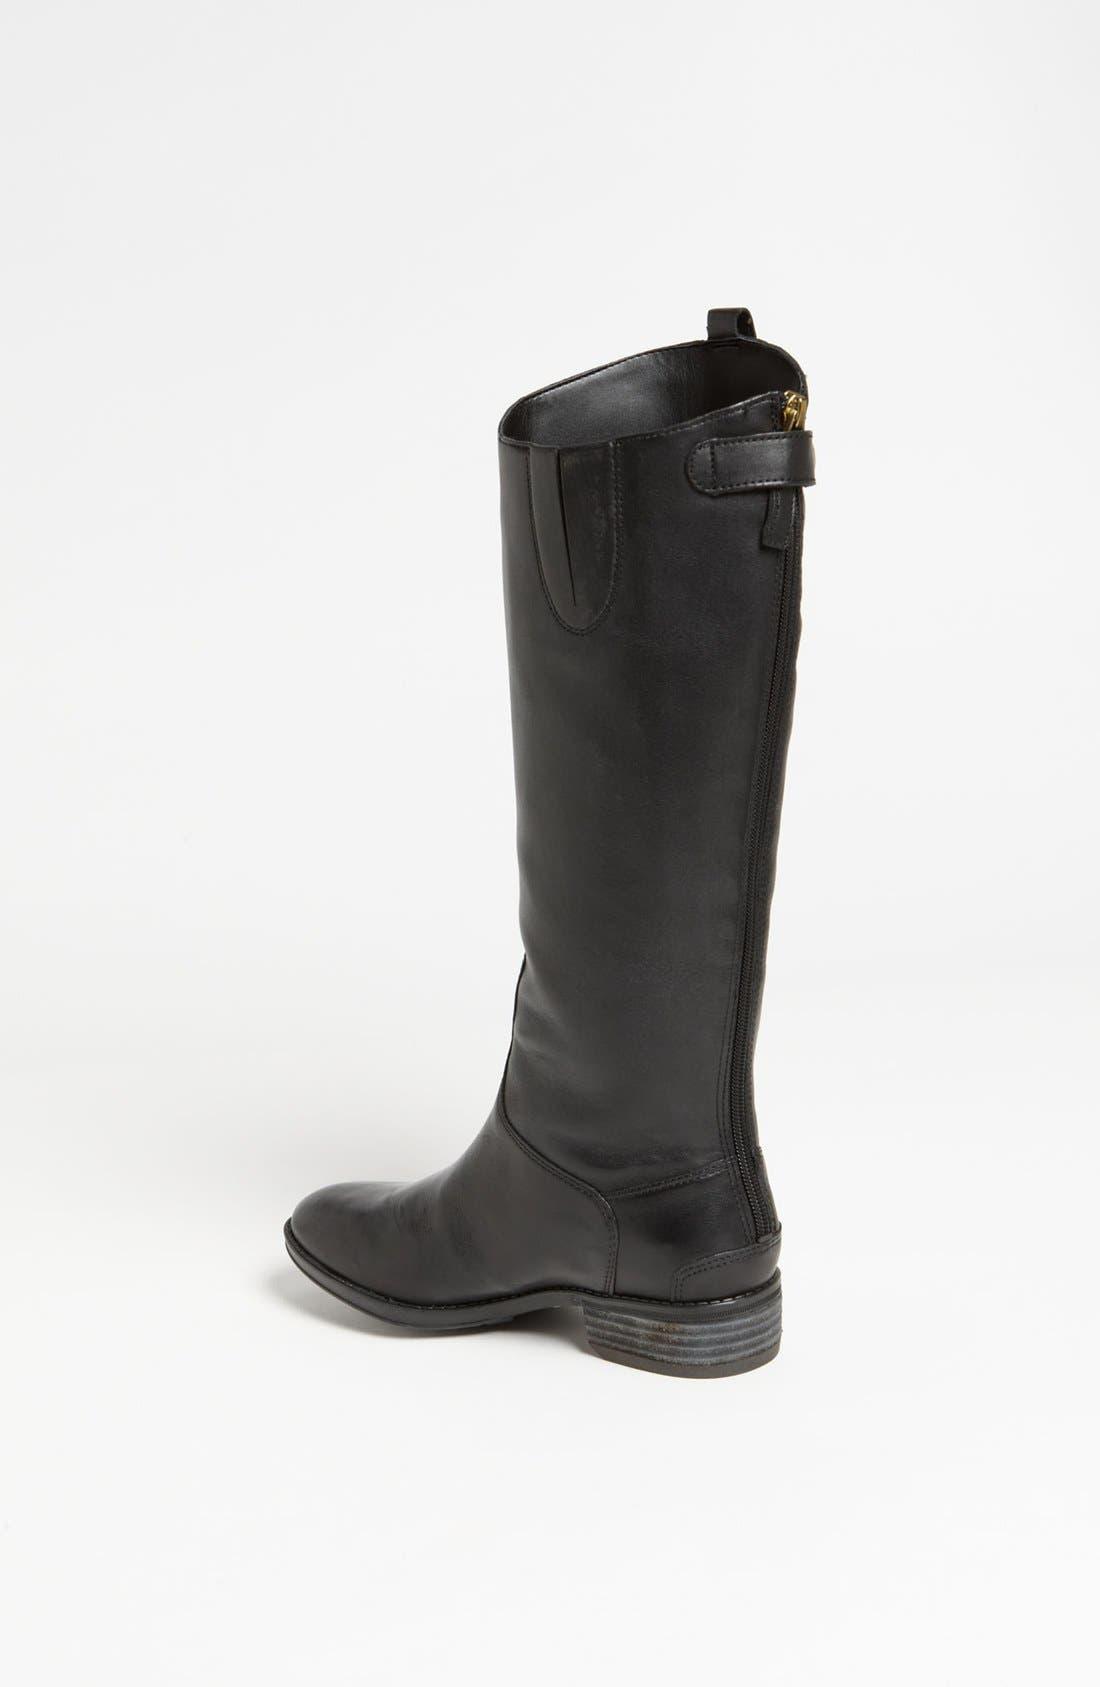 Alternate Image 2  - Sam Edelman 'Penny' Boot (Women) (Wide Calf)